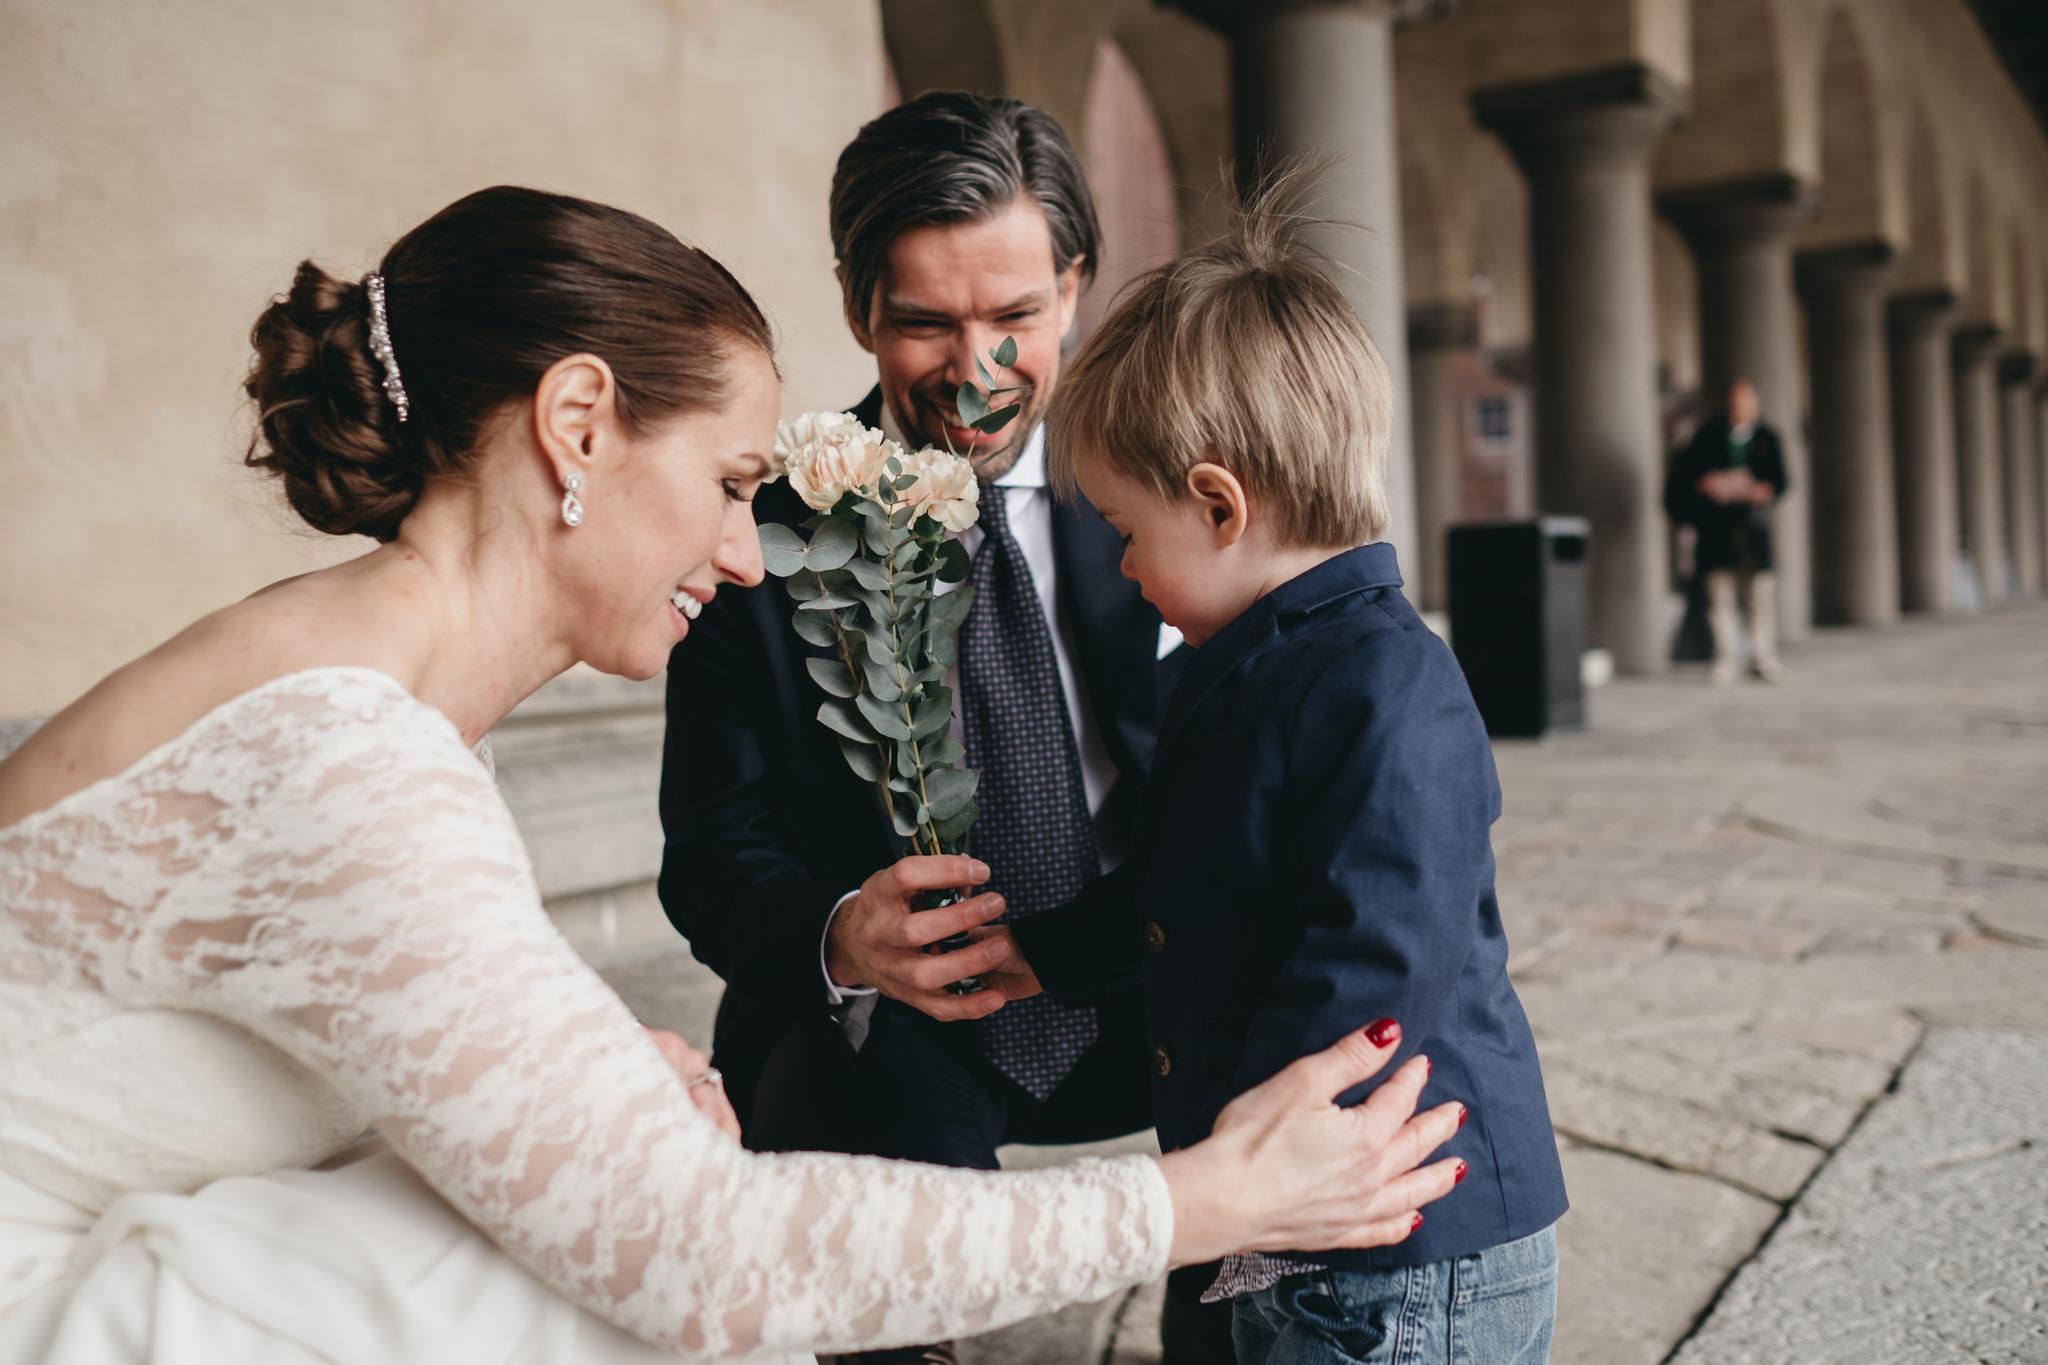 aa846437e634 brollopsfotograf stockholm stadshus, bröllop i stadshuset, vigsel i stockholm  stadshus, borgerlig vigsel fotograf